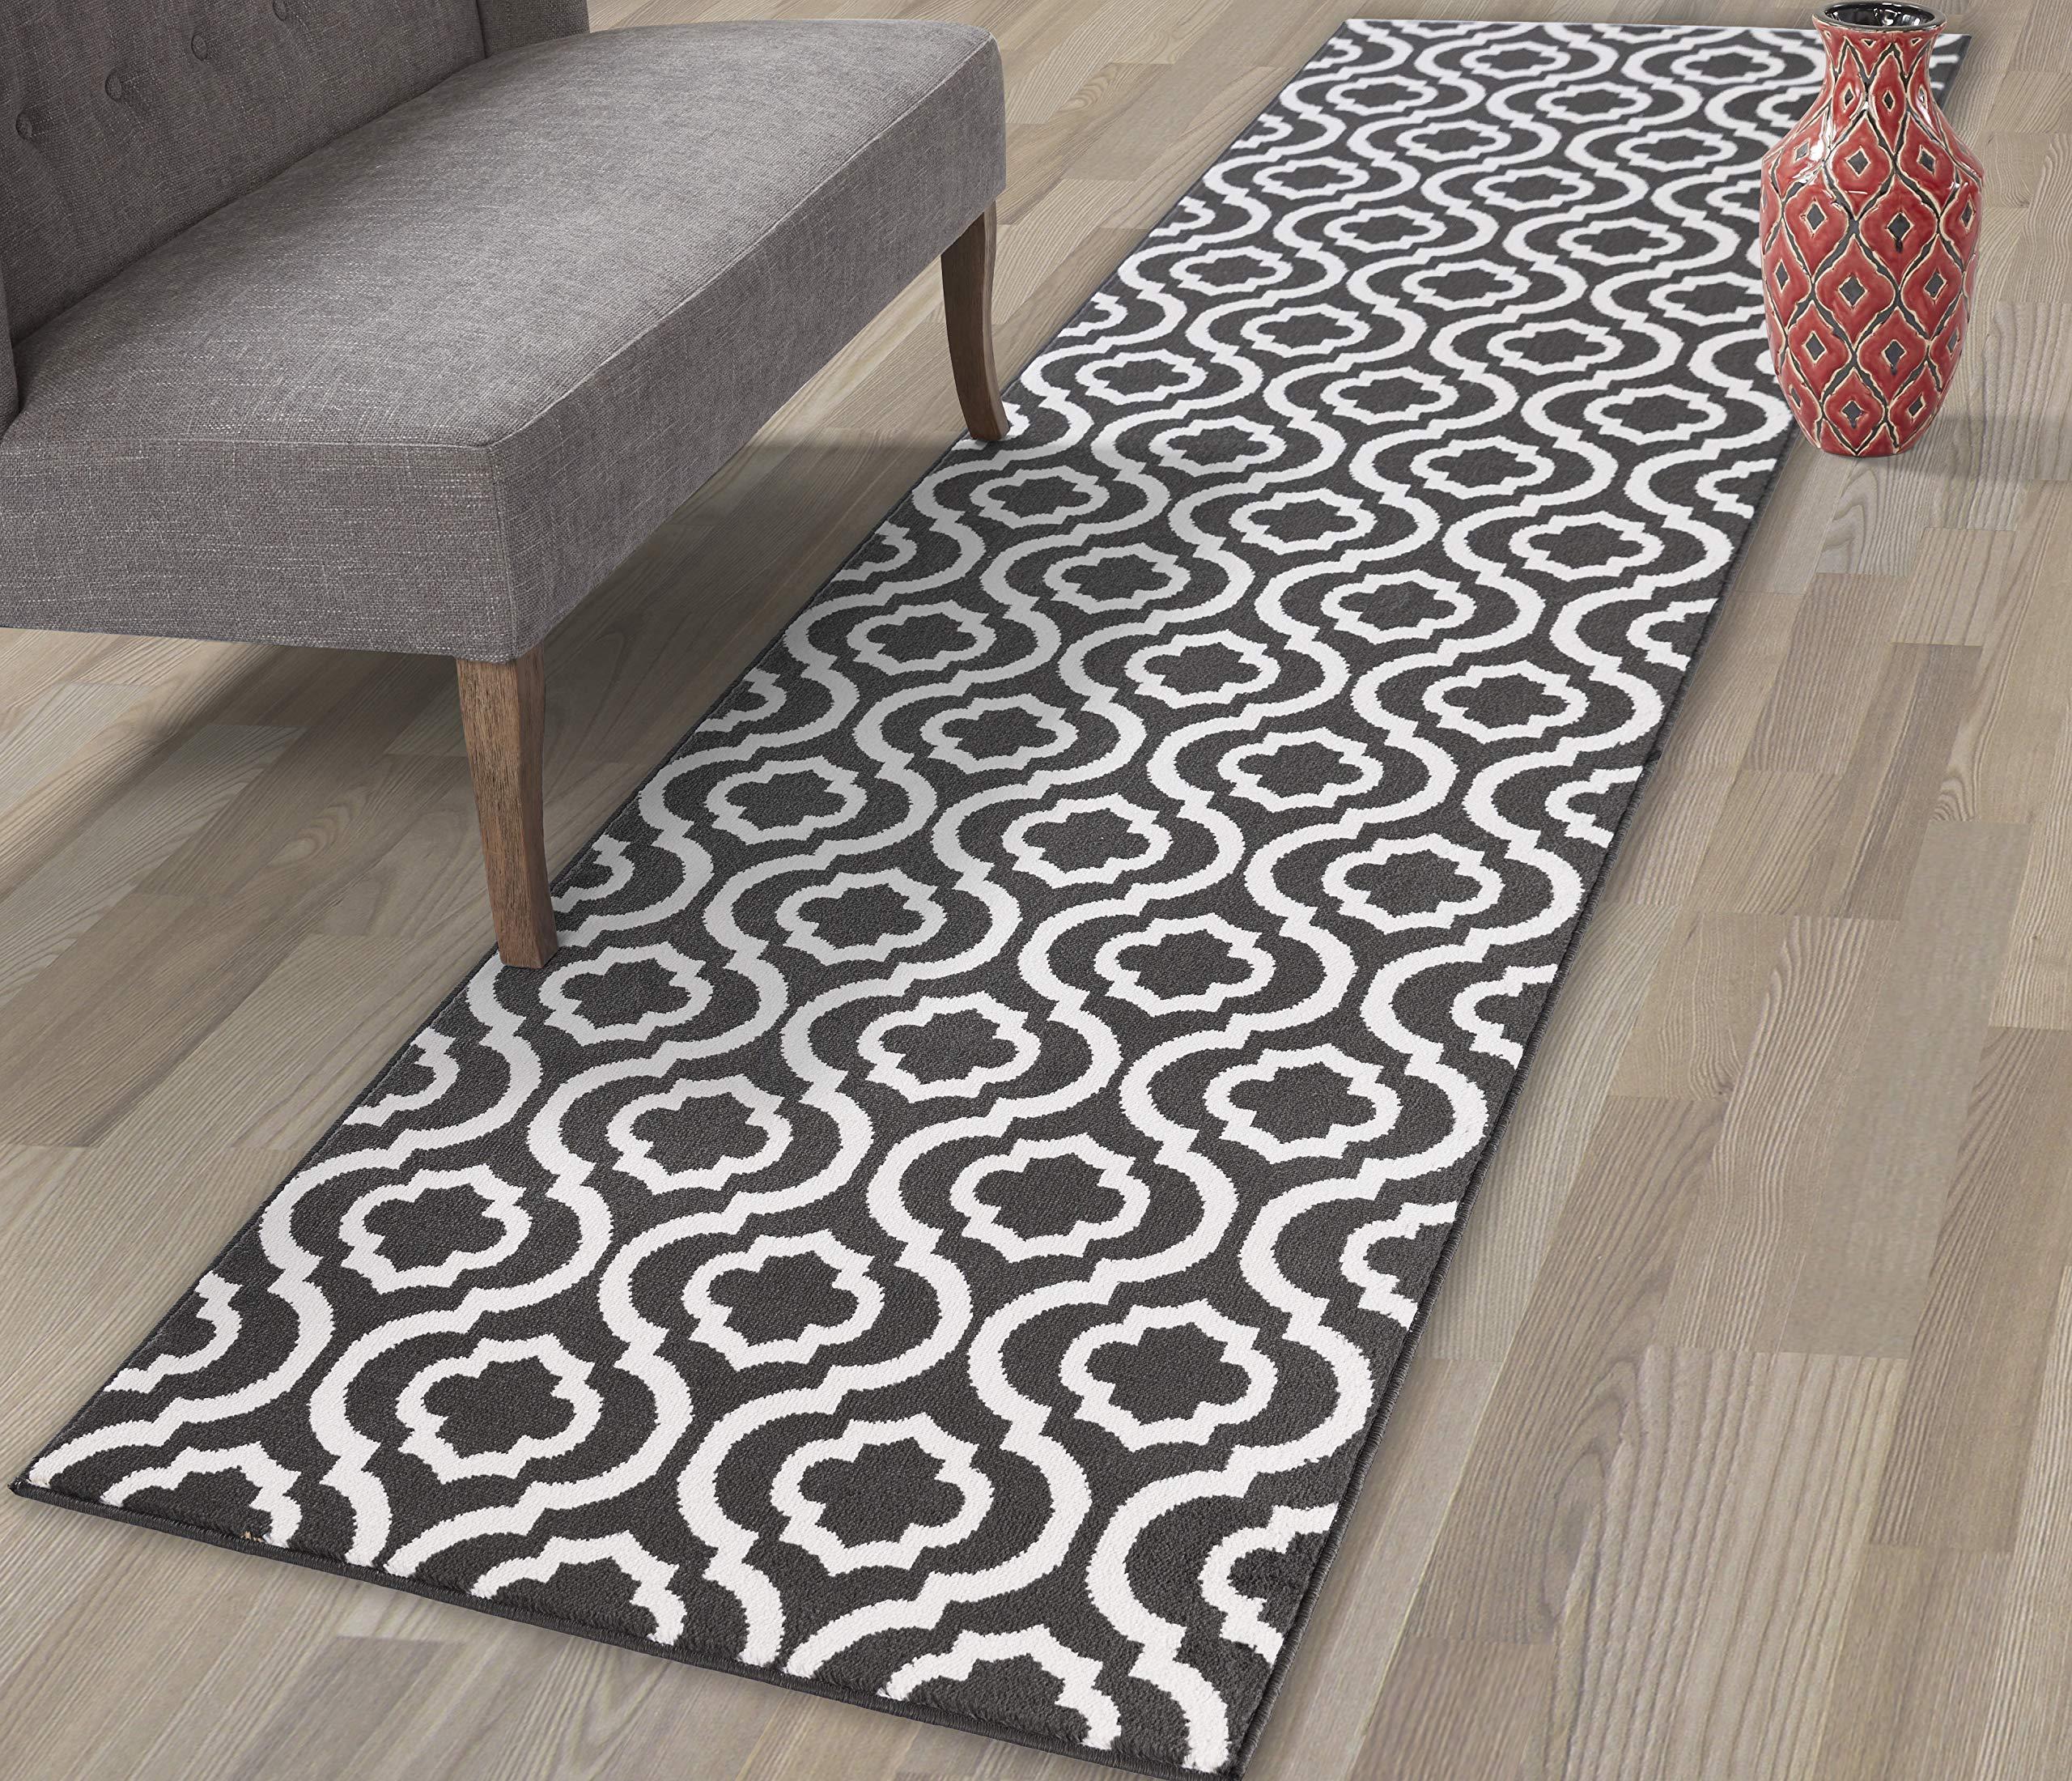 Diagona Designs Contemporary Geometric Moroccan Trellis Design 3' X 10' Runner Area Rug, 31'' W x 118'' L, Charcoal Gray/Ivory (JAS2039)